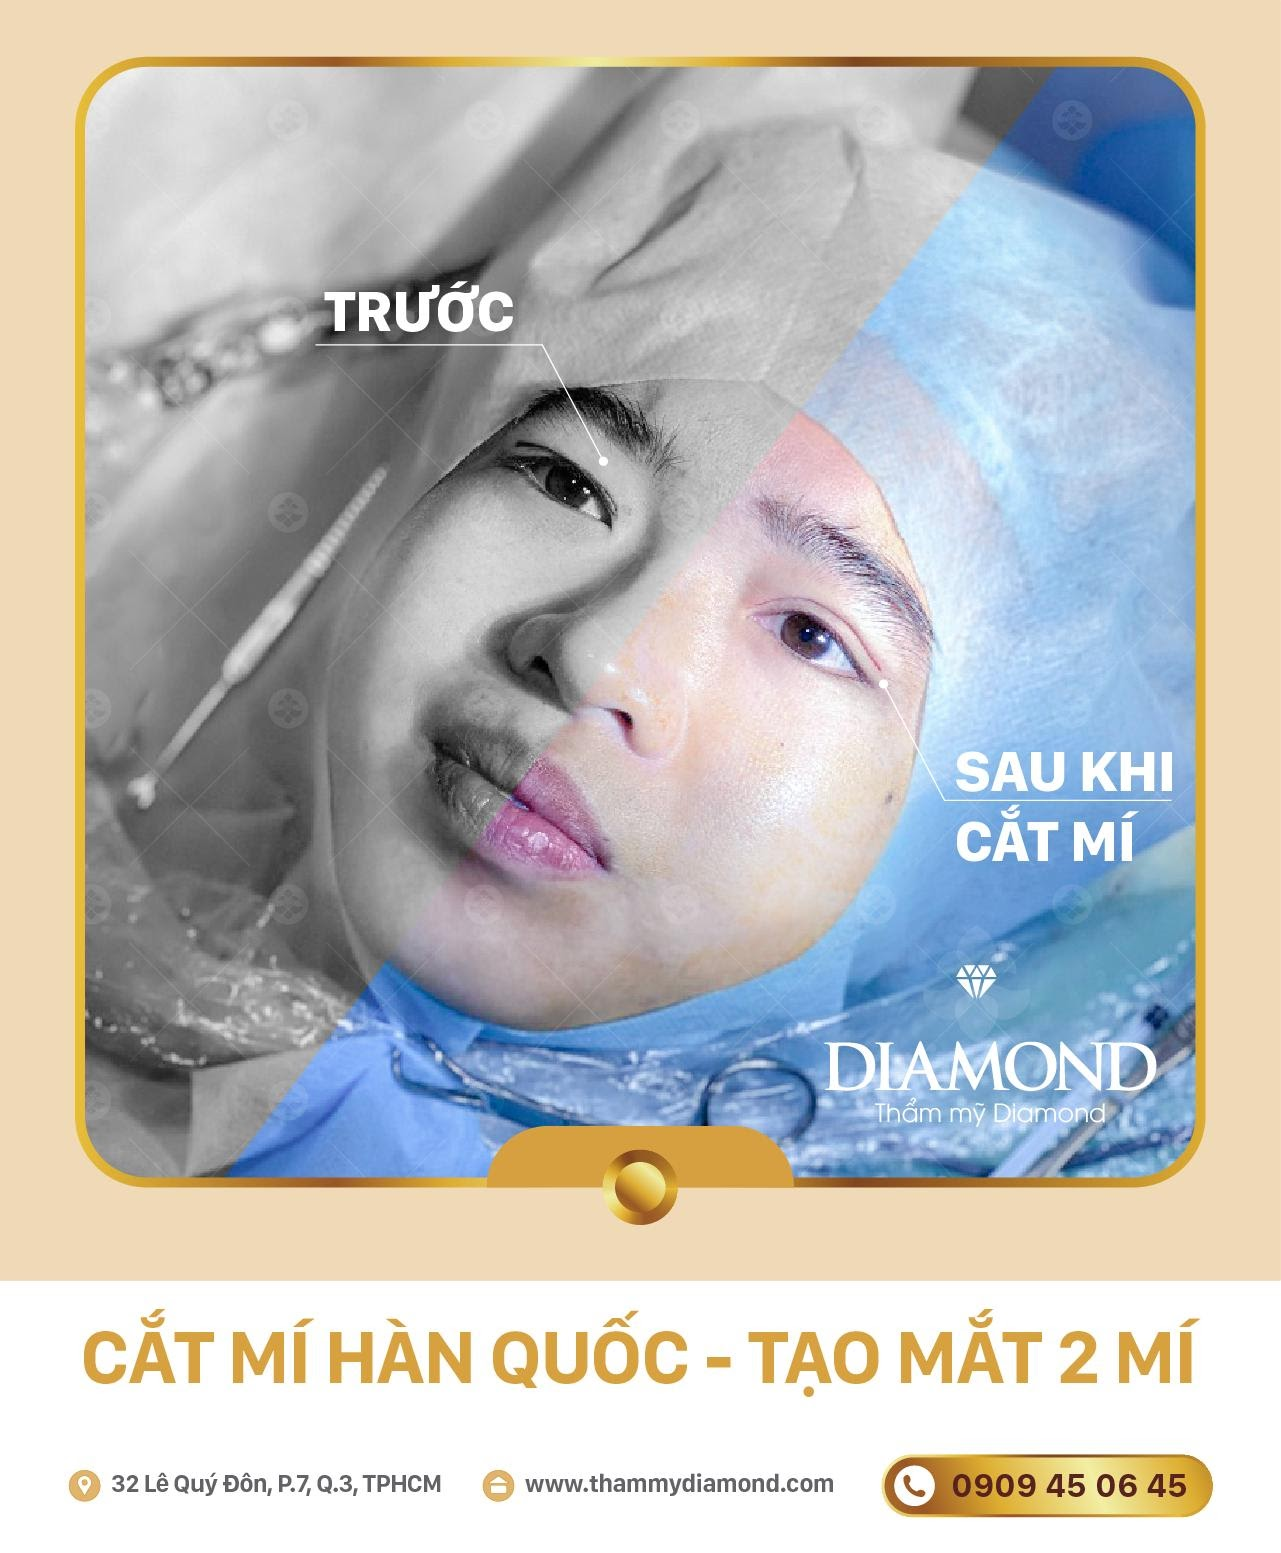 truoc-sau-khach-hang-cat-mi-mat-diamond